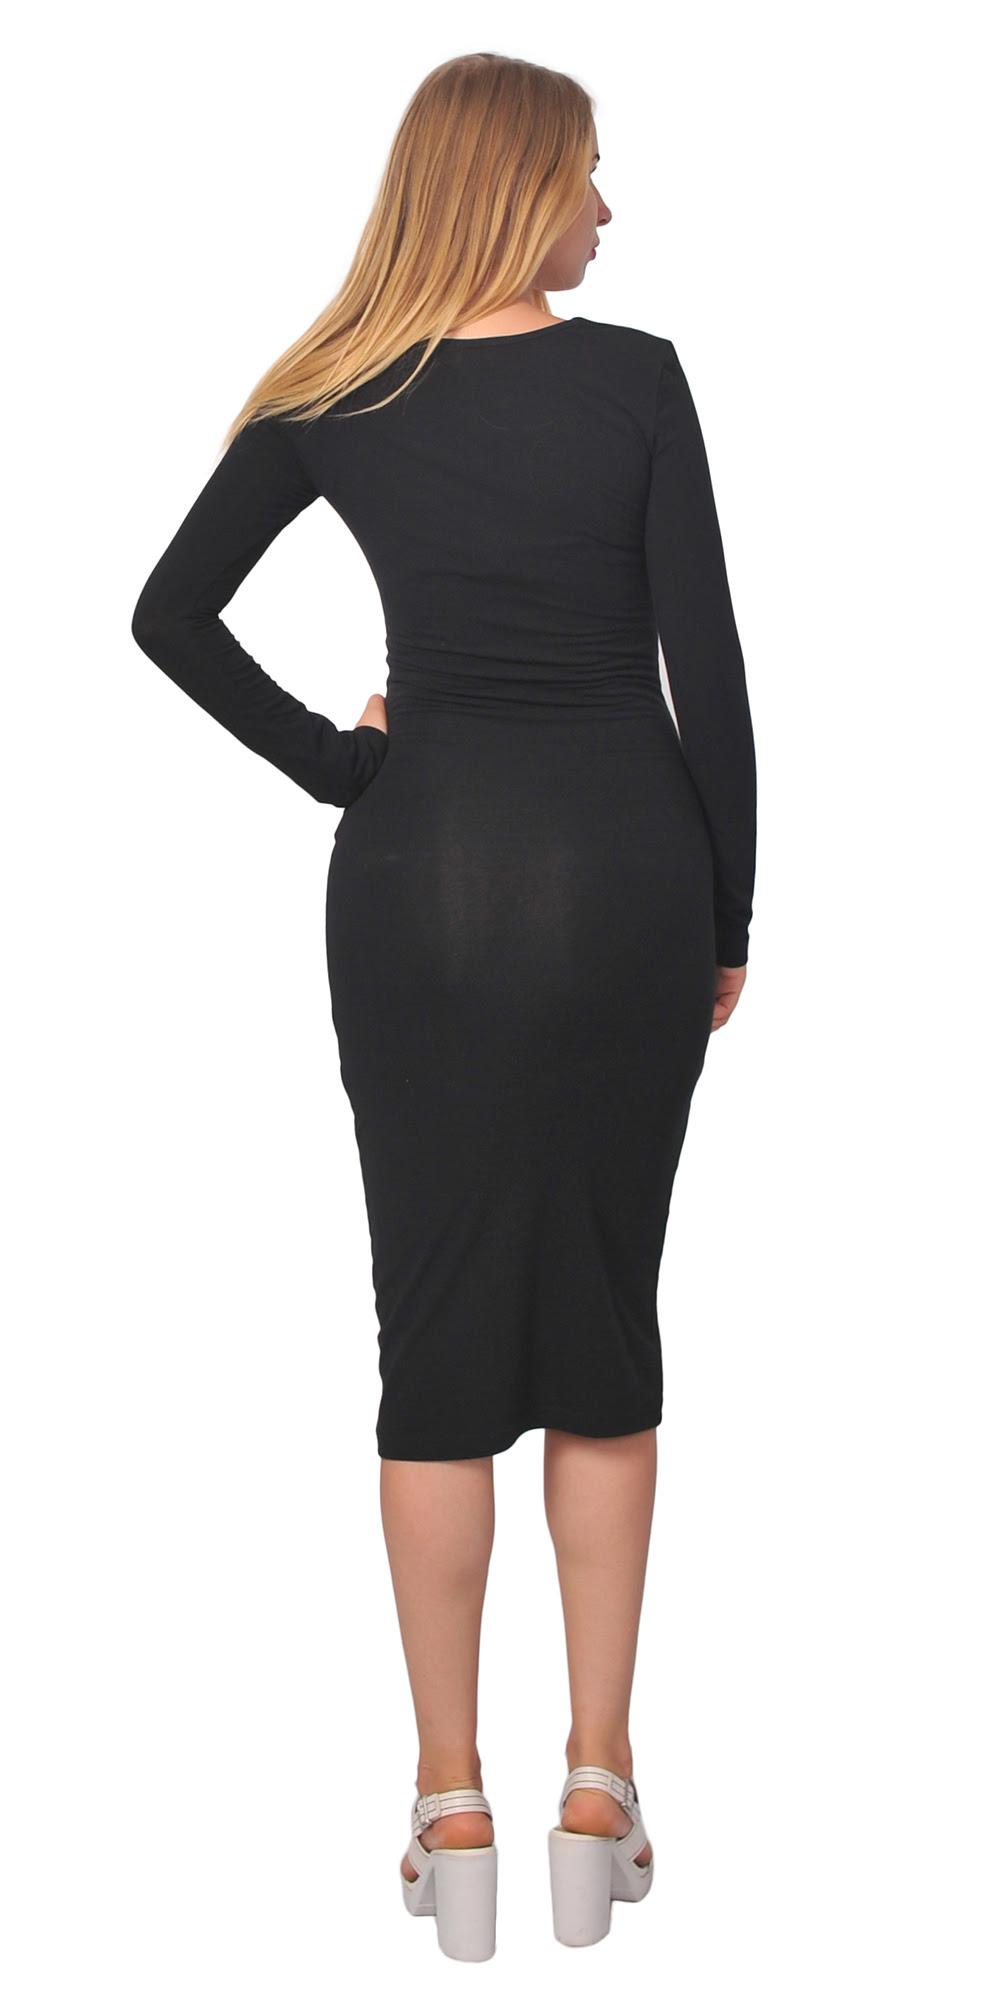 Womens bodycon midi dresses